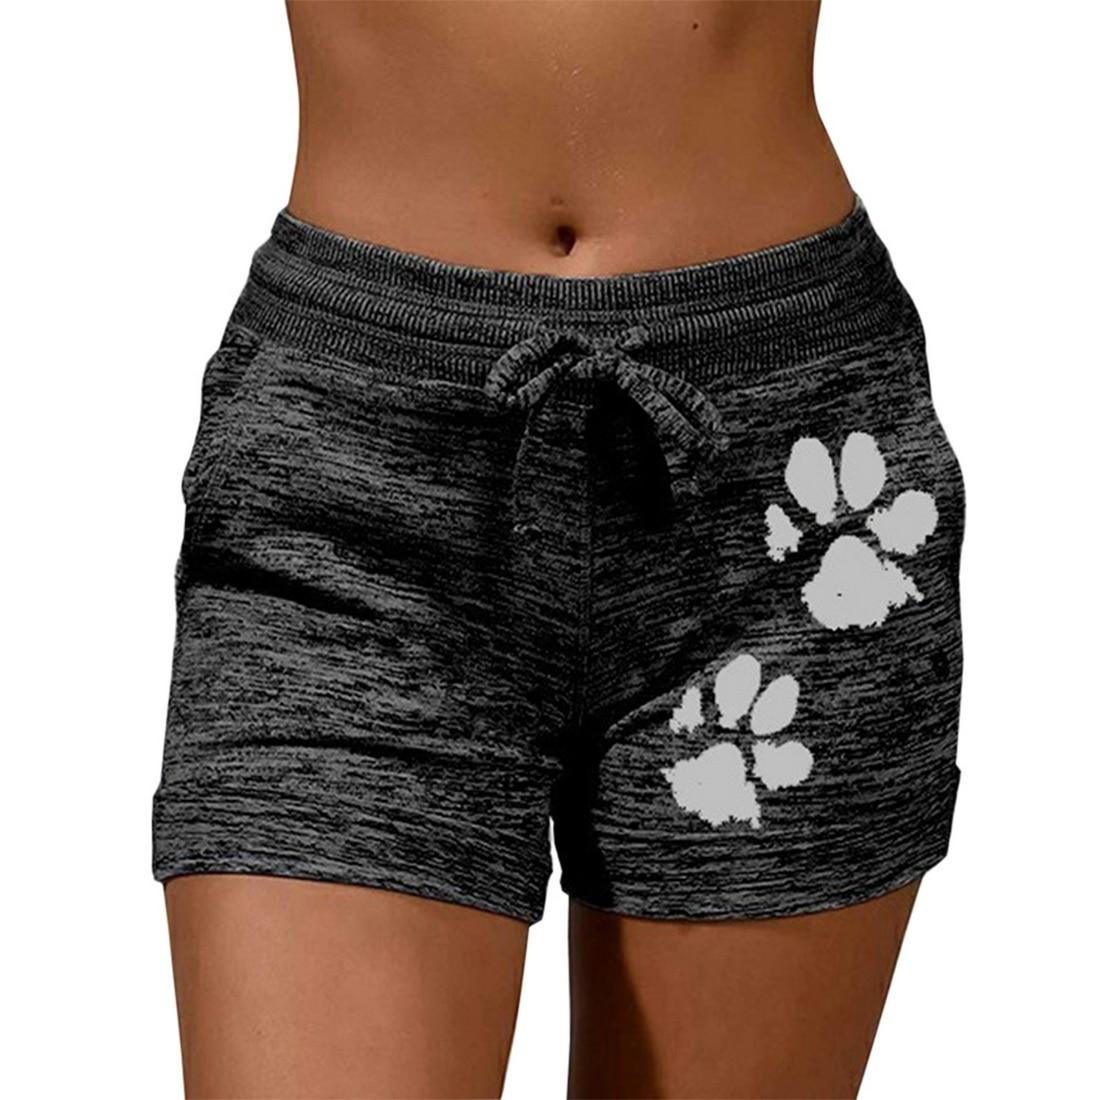 Muyogrt Summer Women Casual Running Sports Shorts Waistband Elastic Waist Shorts Fashion Female Girls Paw Print Loose Shorts 6